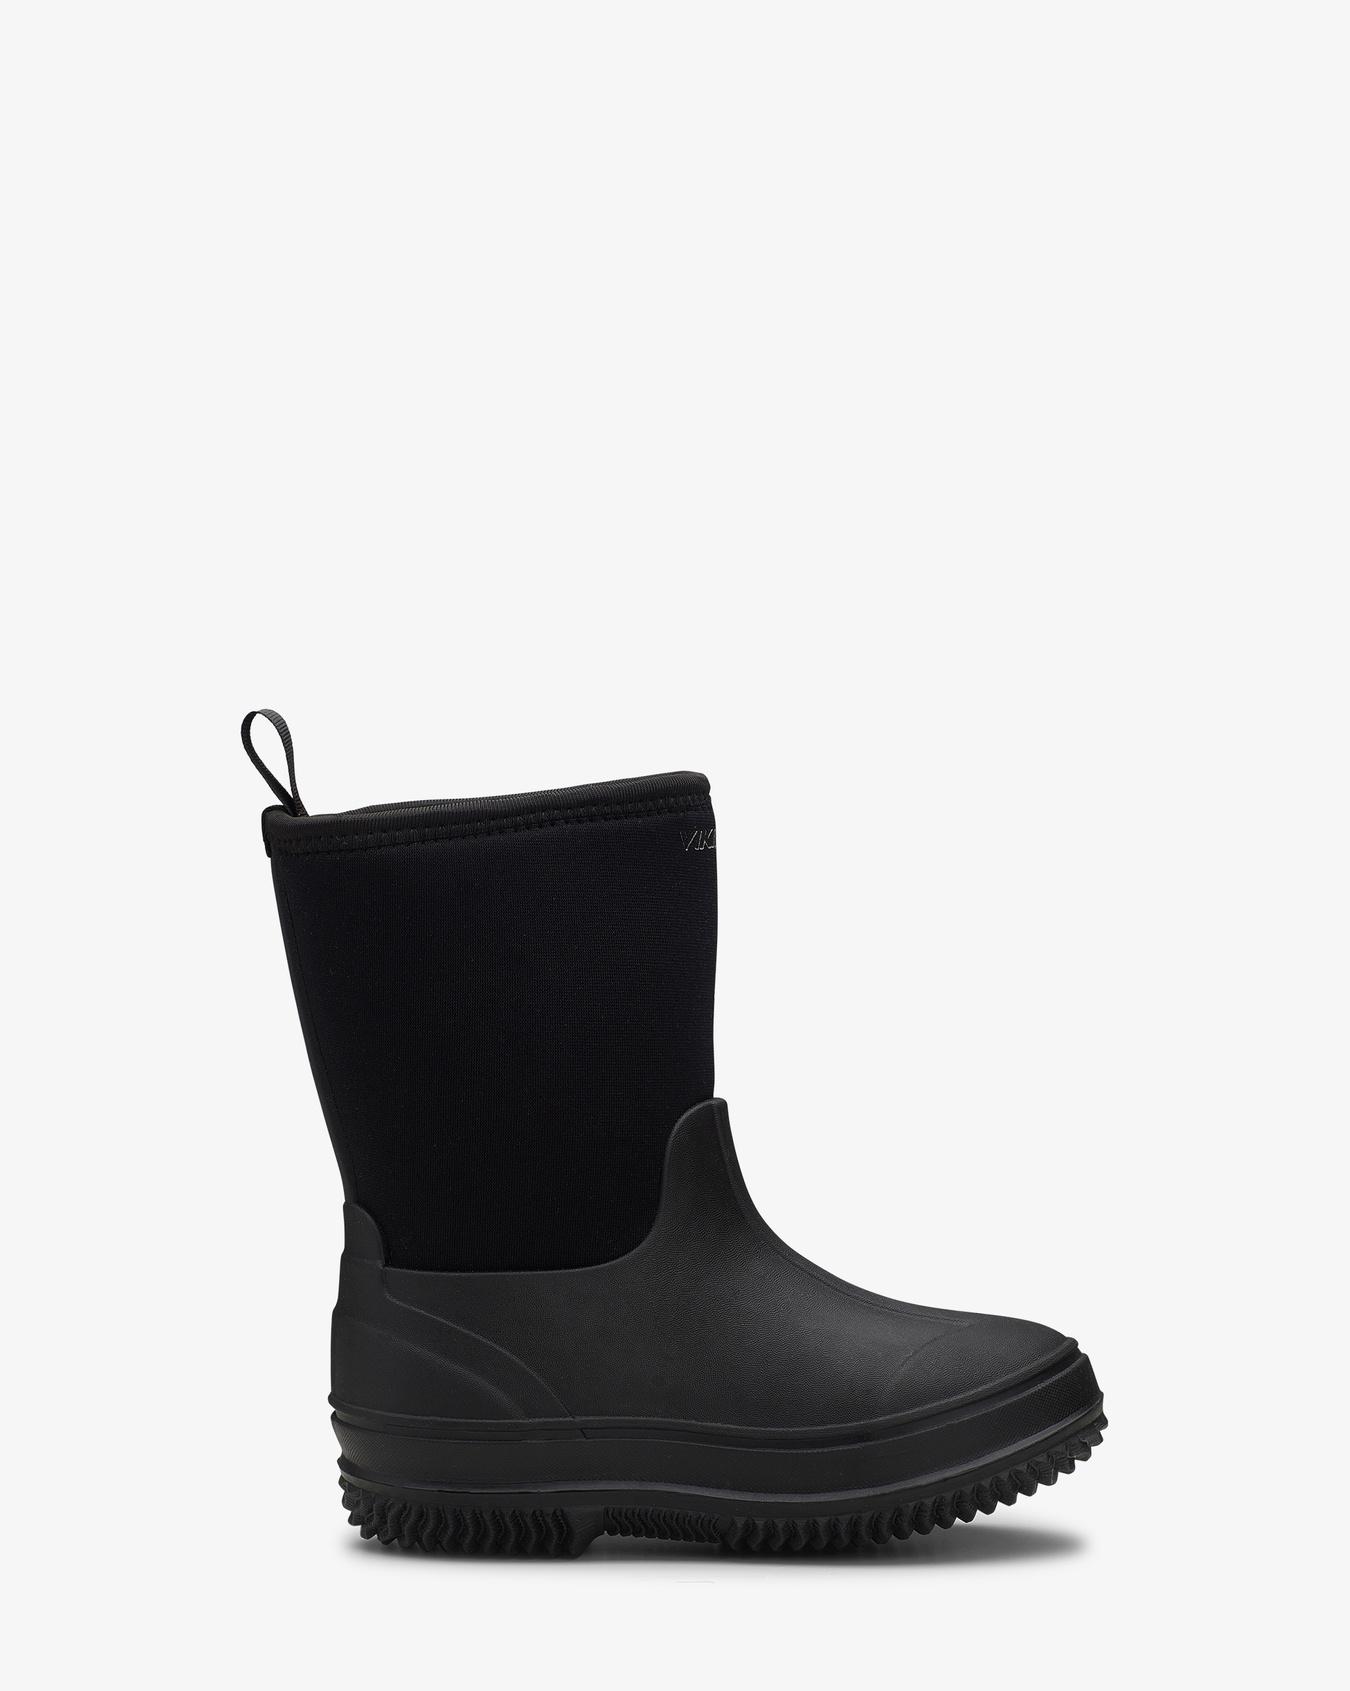 Slush Black All-weather Boots